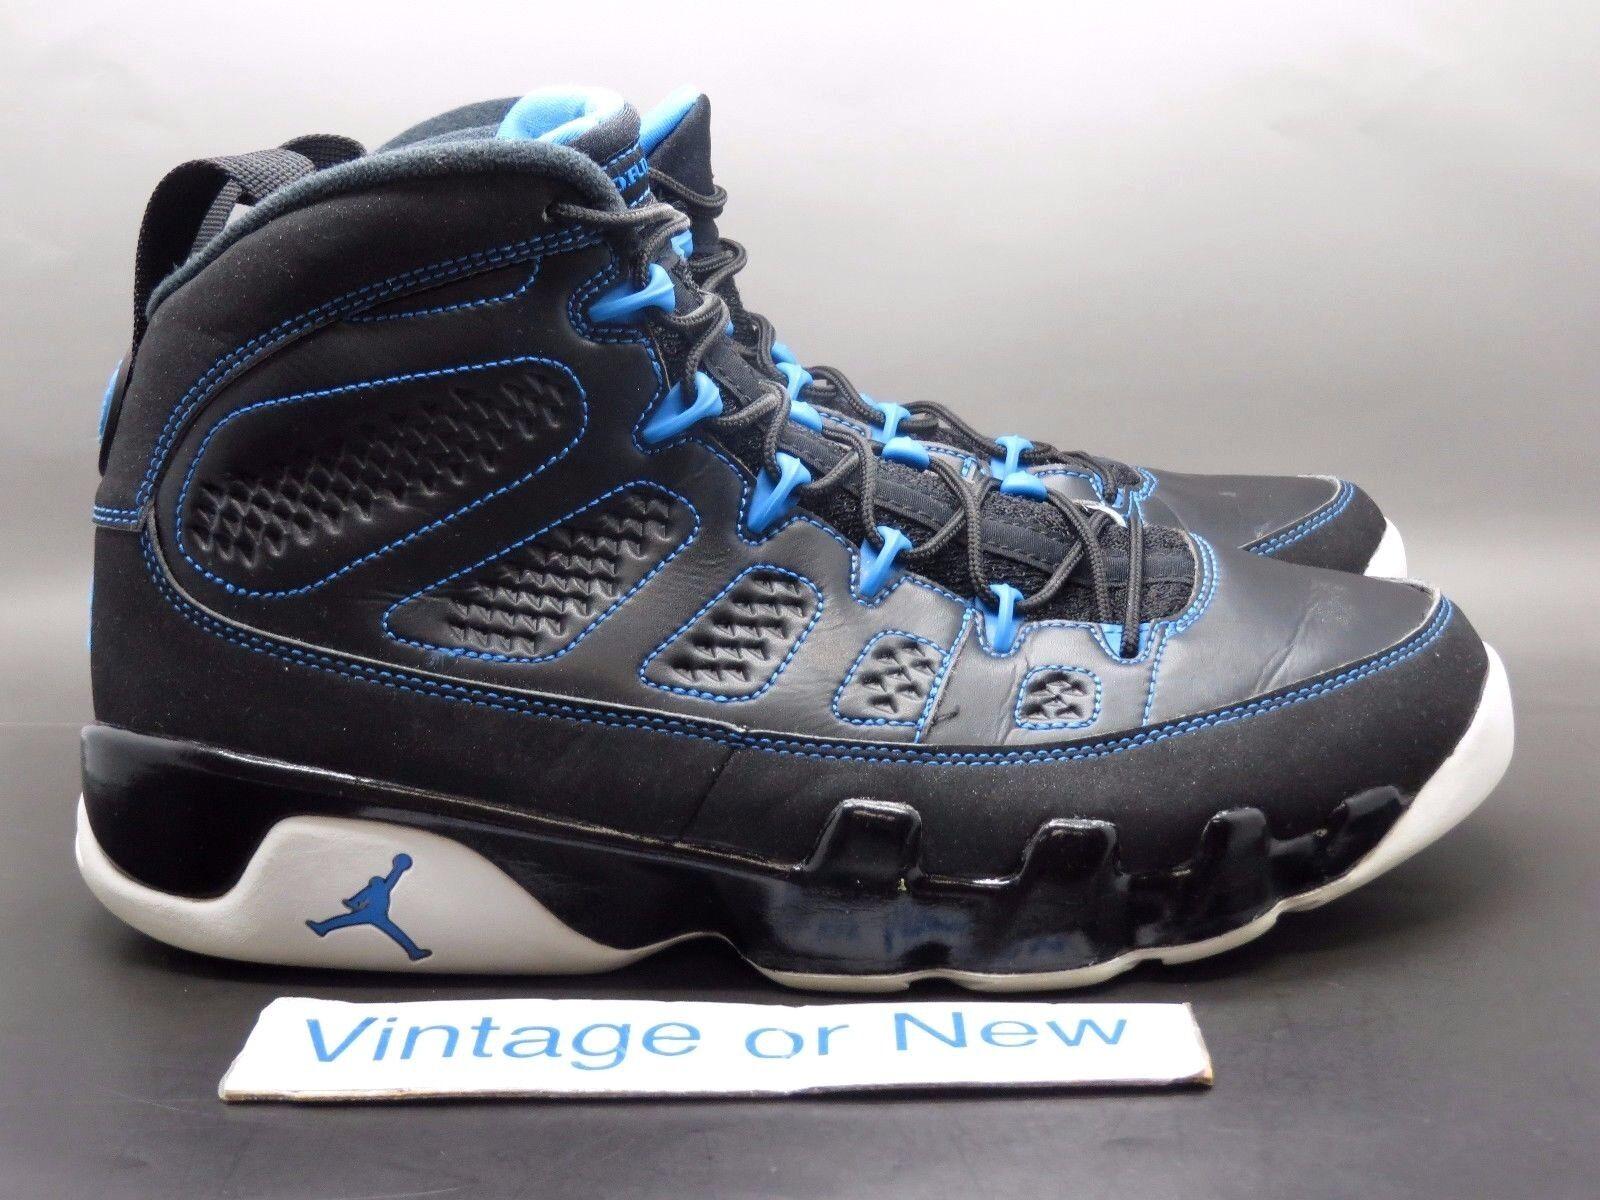 Air Jordan IX 9 Photo Blue Retro 2012 Price reduction Great discount